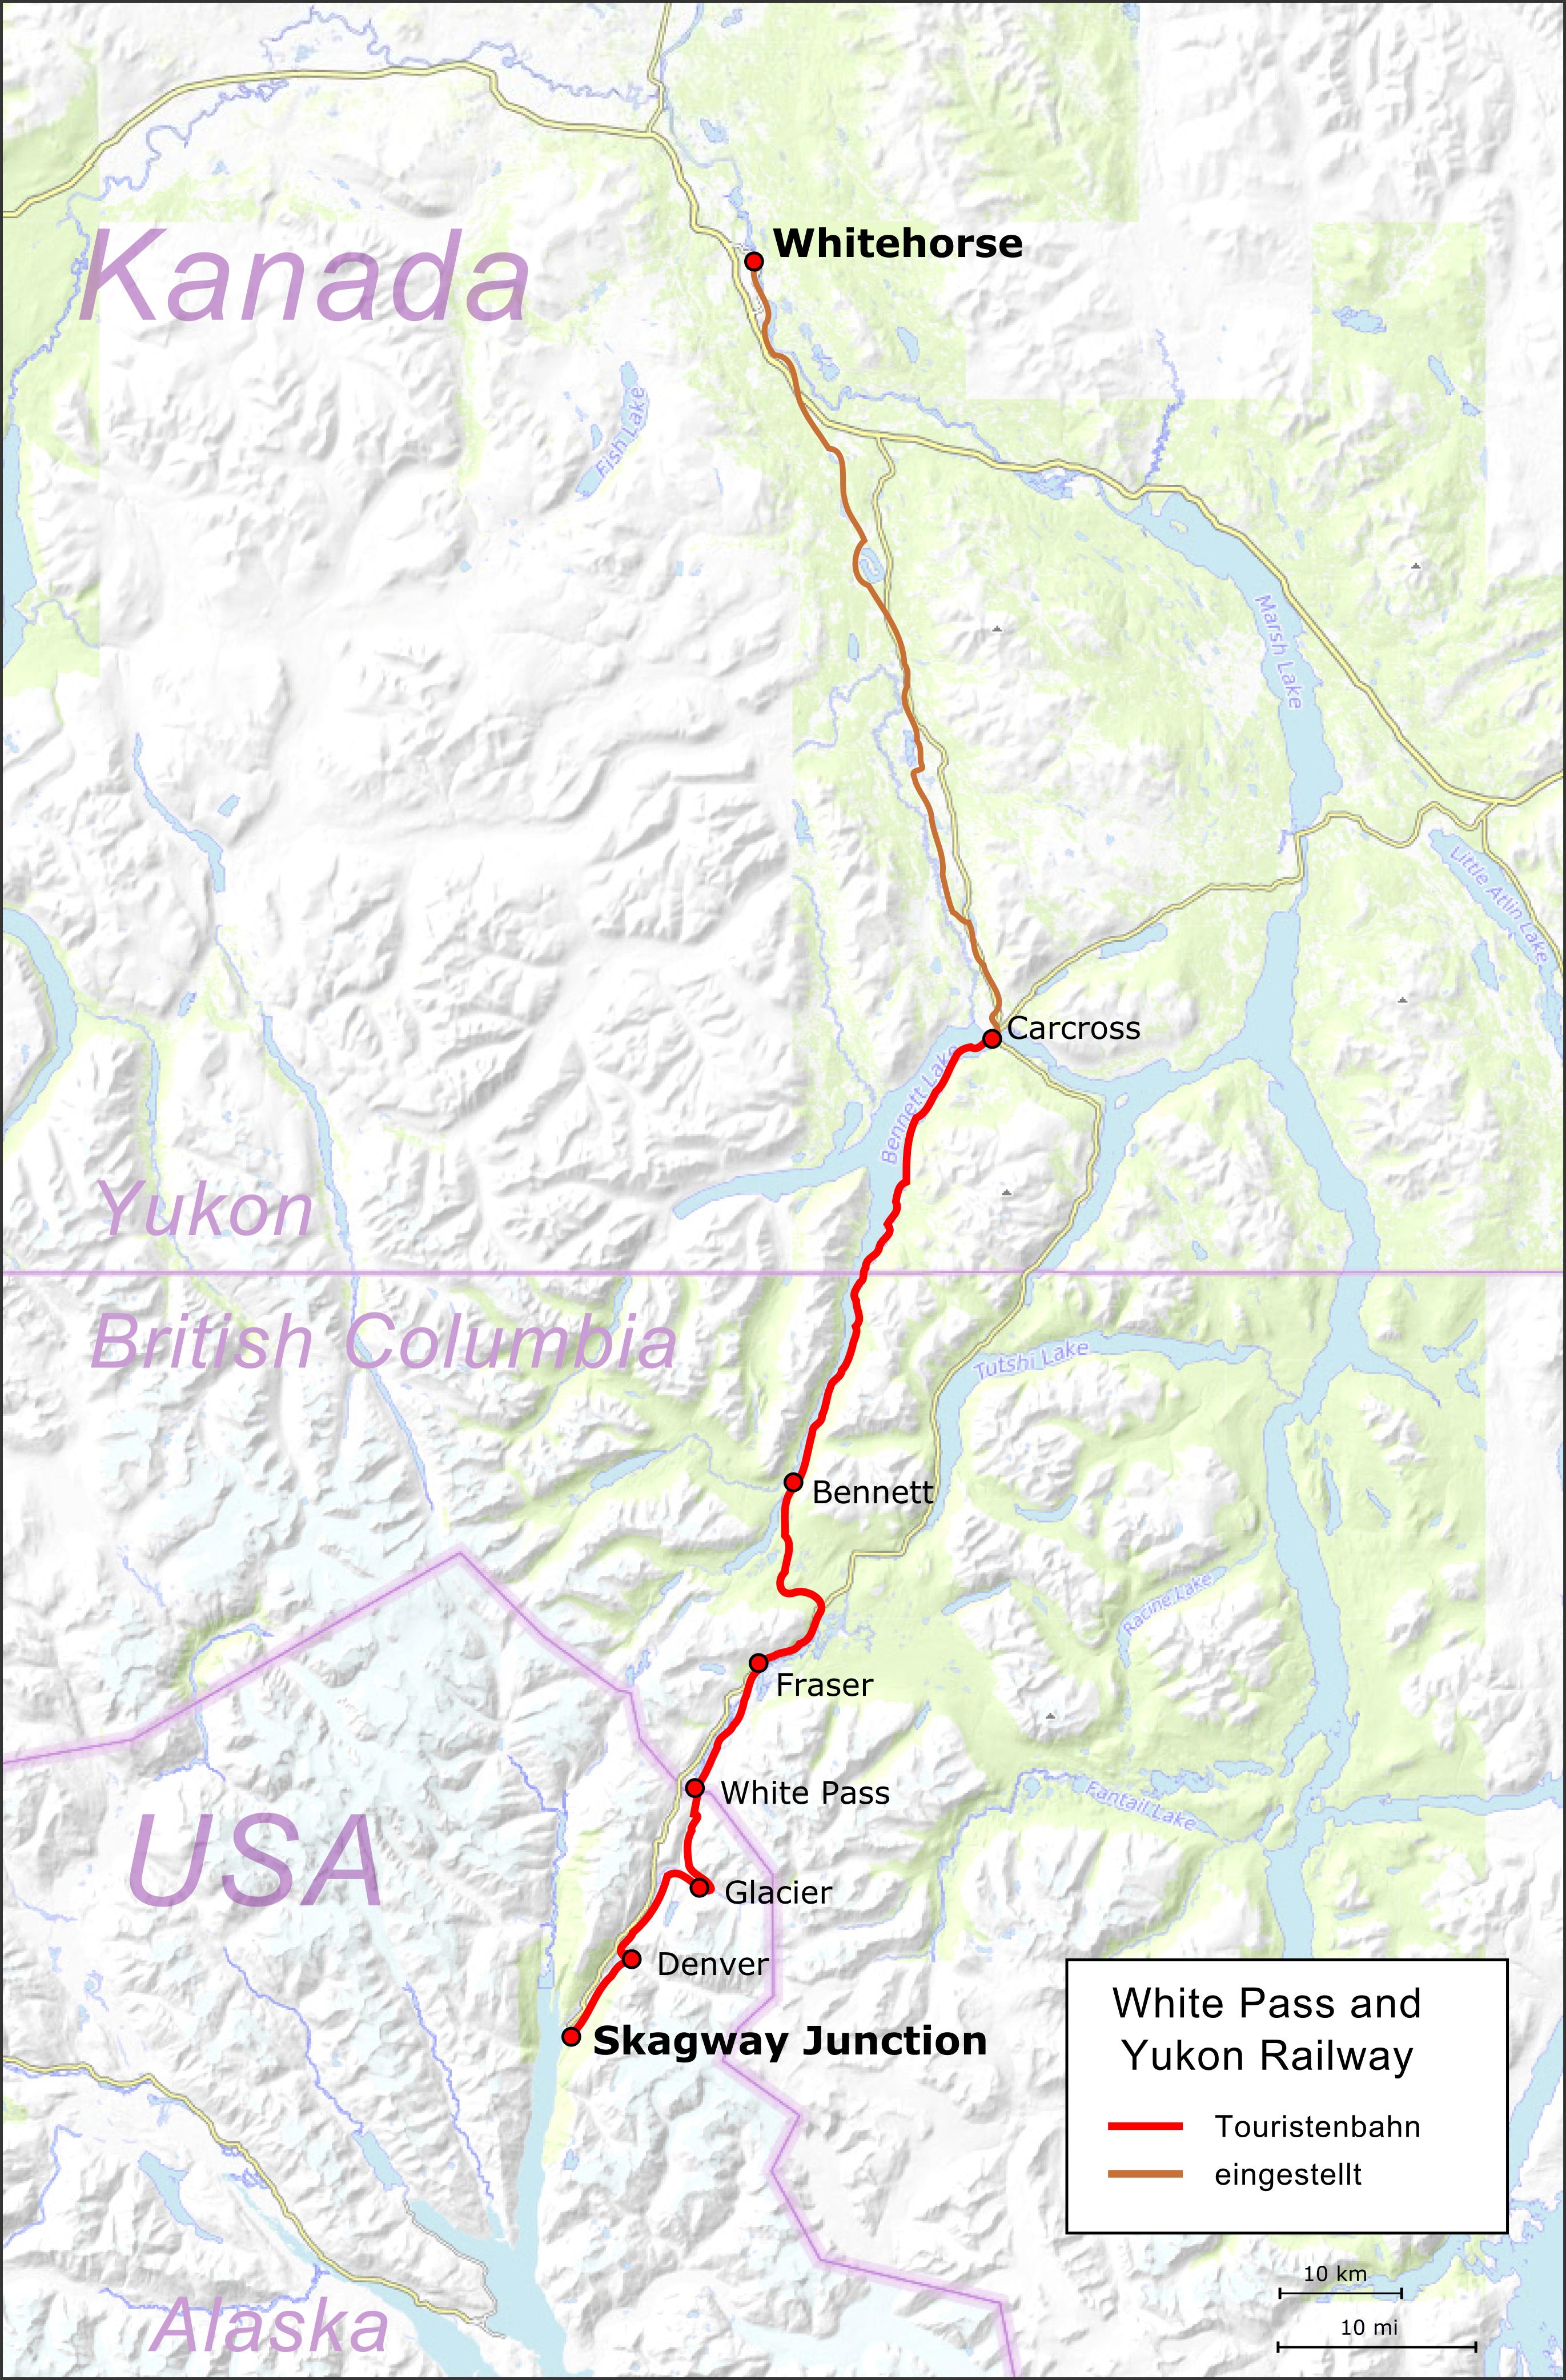 File:Map White P and Yukon Route de.png - Wikimedia Commons on quebec map, northwest territories map, klondike map, nunavut map, mountain creek lake map, british columbia map, inola map, p.e.i map, north america map, canada map, toronto map, whitestone map, newfoundland map, mackenzie mountains map, alberta map, dawson city map, alaska map, skagway map, yangtze map, arizona map,